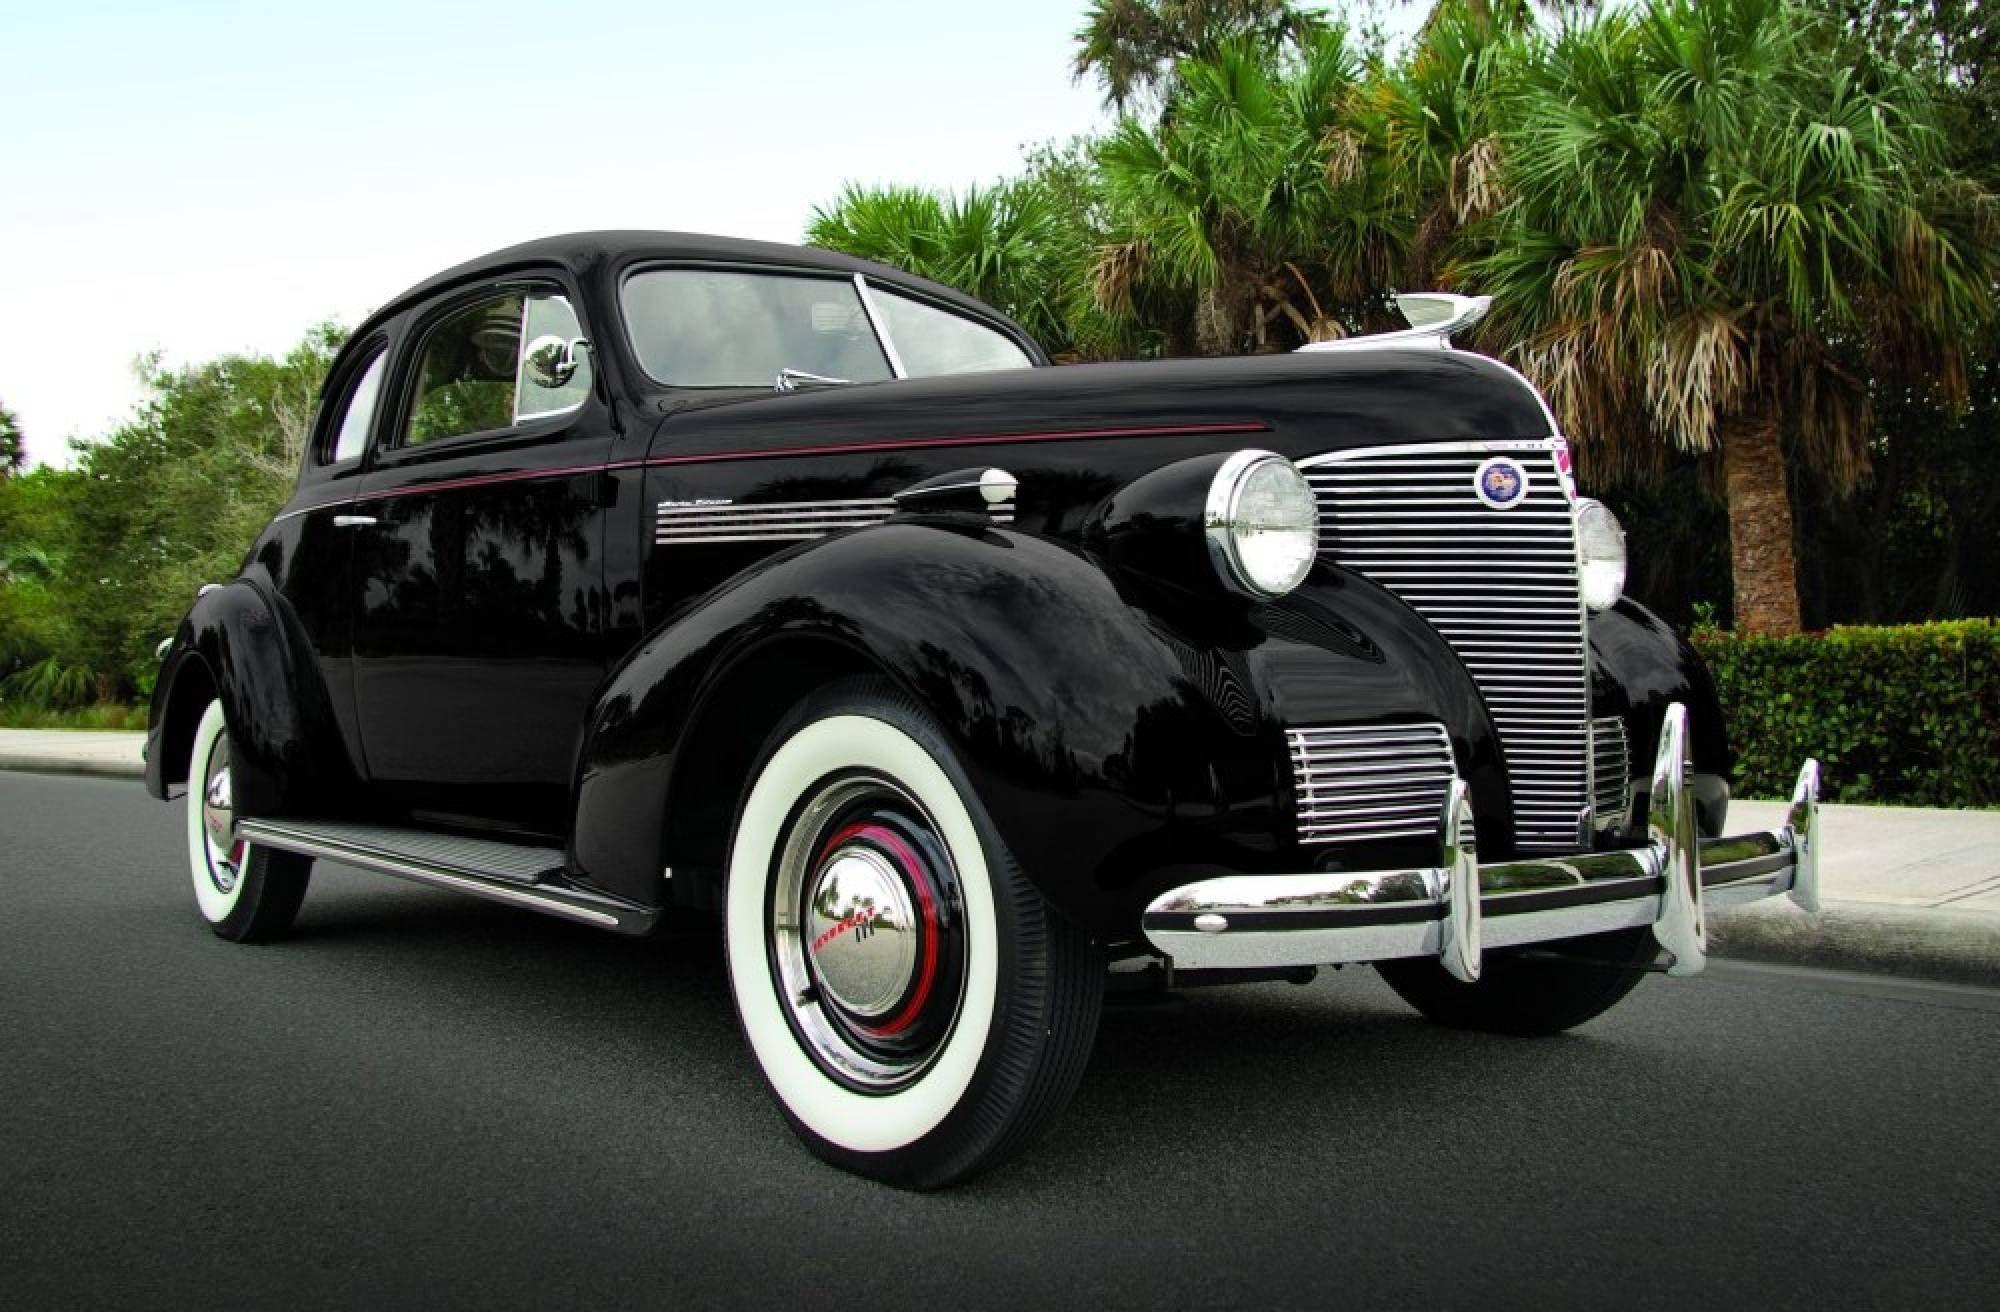 1939 Chevrolet Master De Luxe 2dr sedan